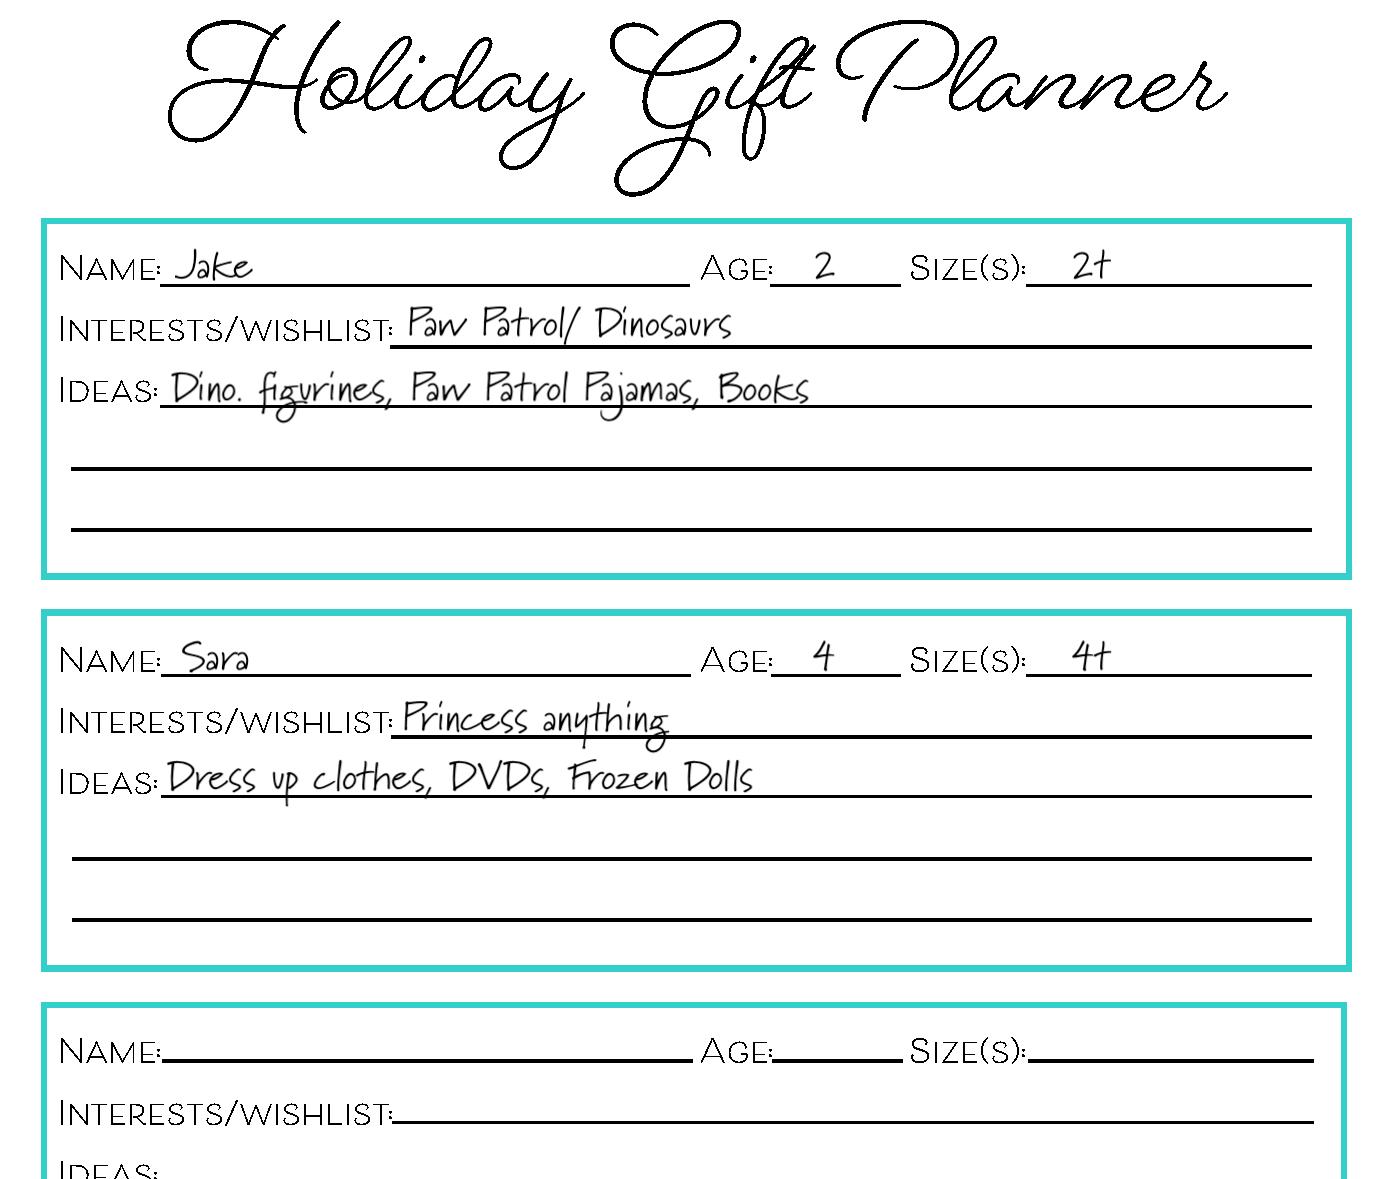 Free Christmas T Planner Printable